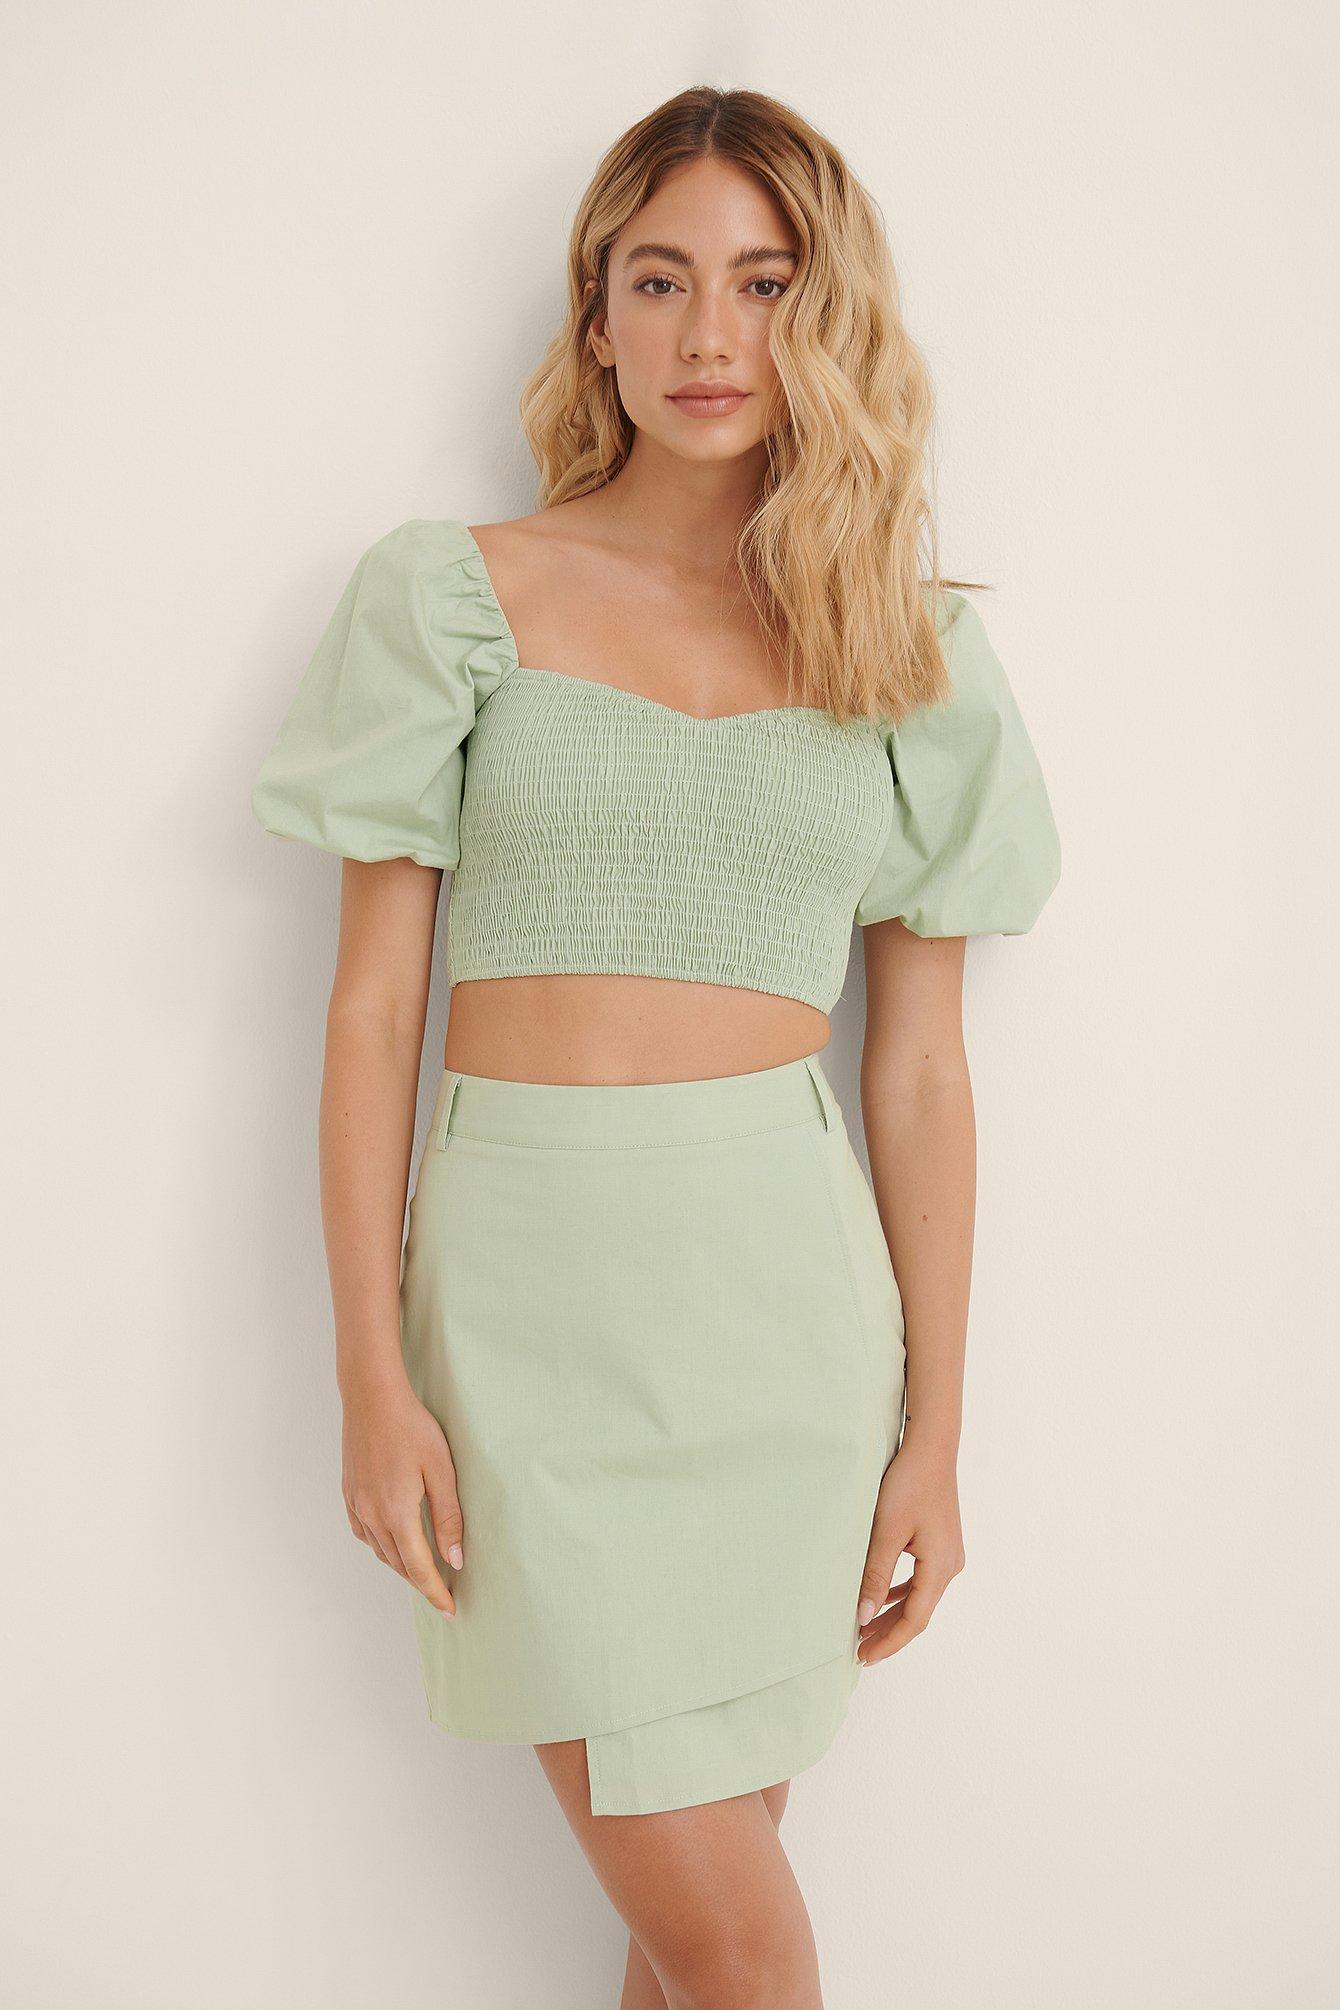 Amaka Hamelijnck x NA-KD Uneven Skirt - Green